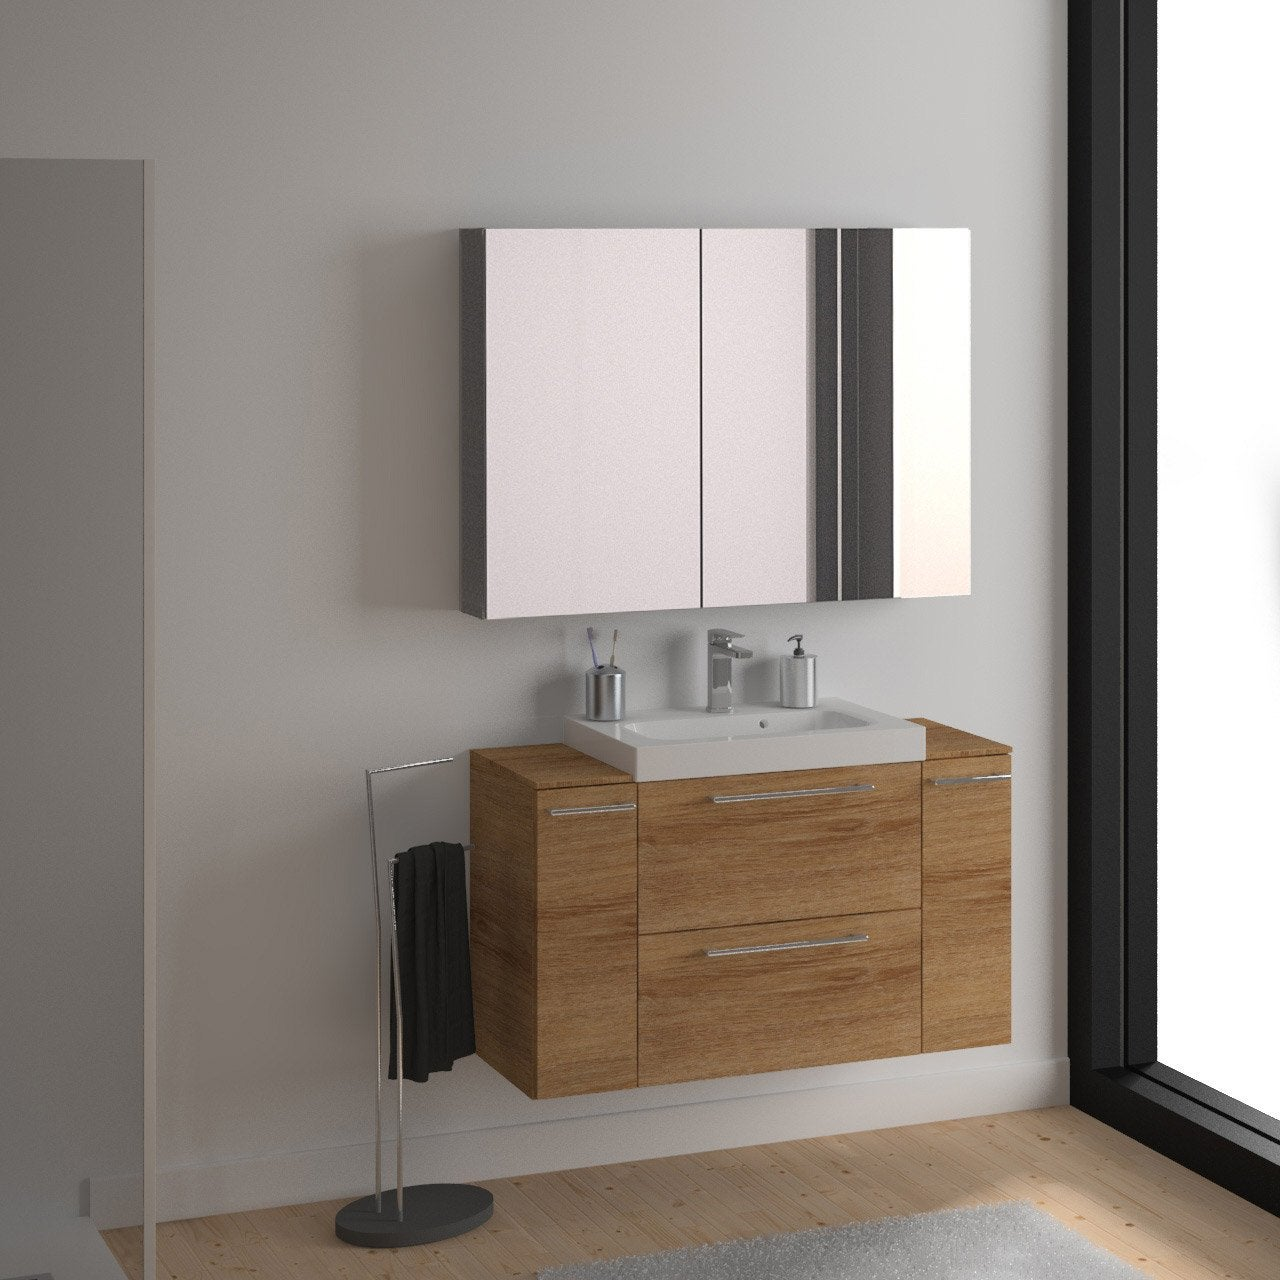 Meuble de salle de bains remix imitation ch ne 61x48 5 cm for Porte de meuble salle de bain leroy merlin